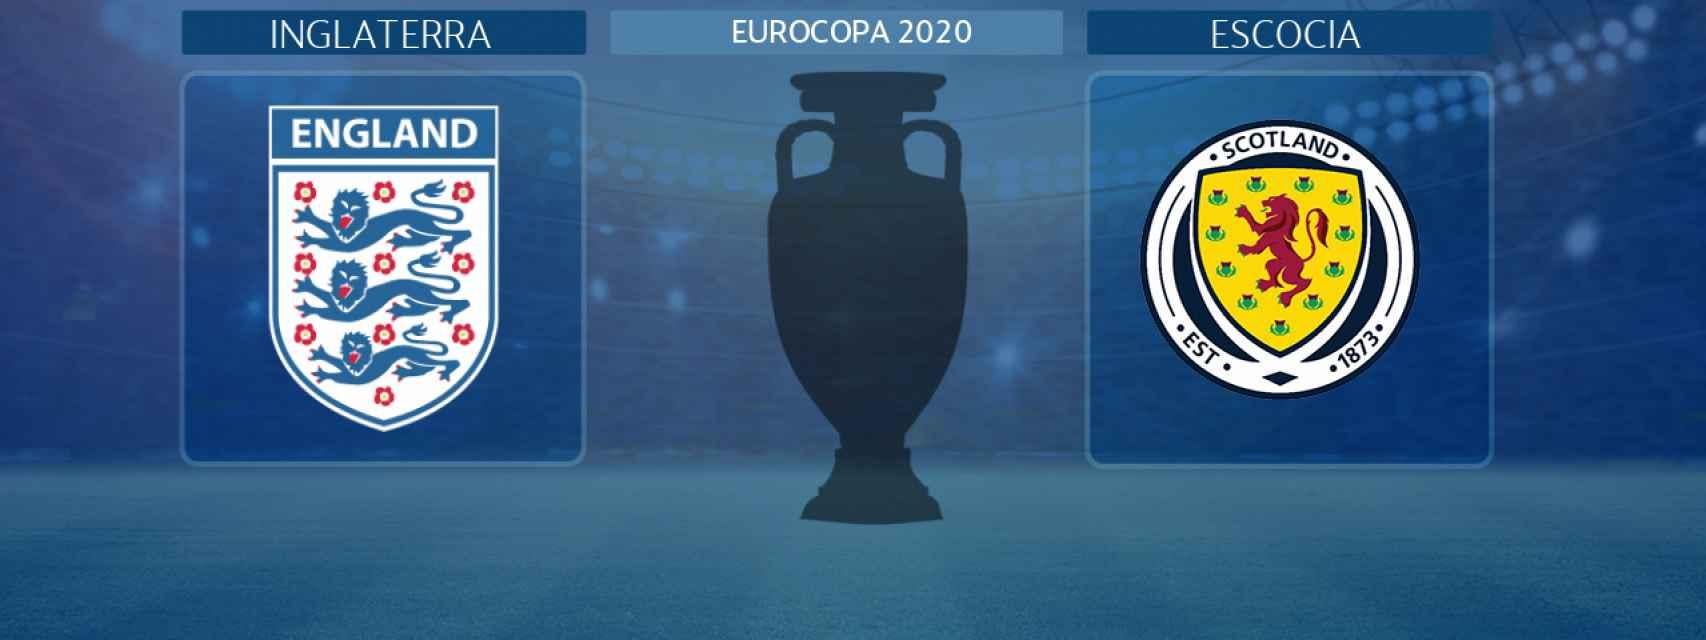 Inglaterra - Escocia, partido de la Eurocopa 2020